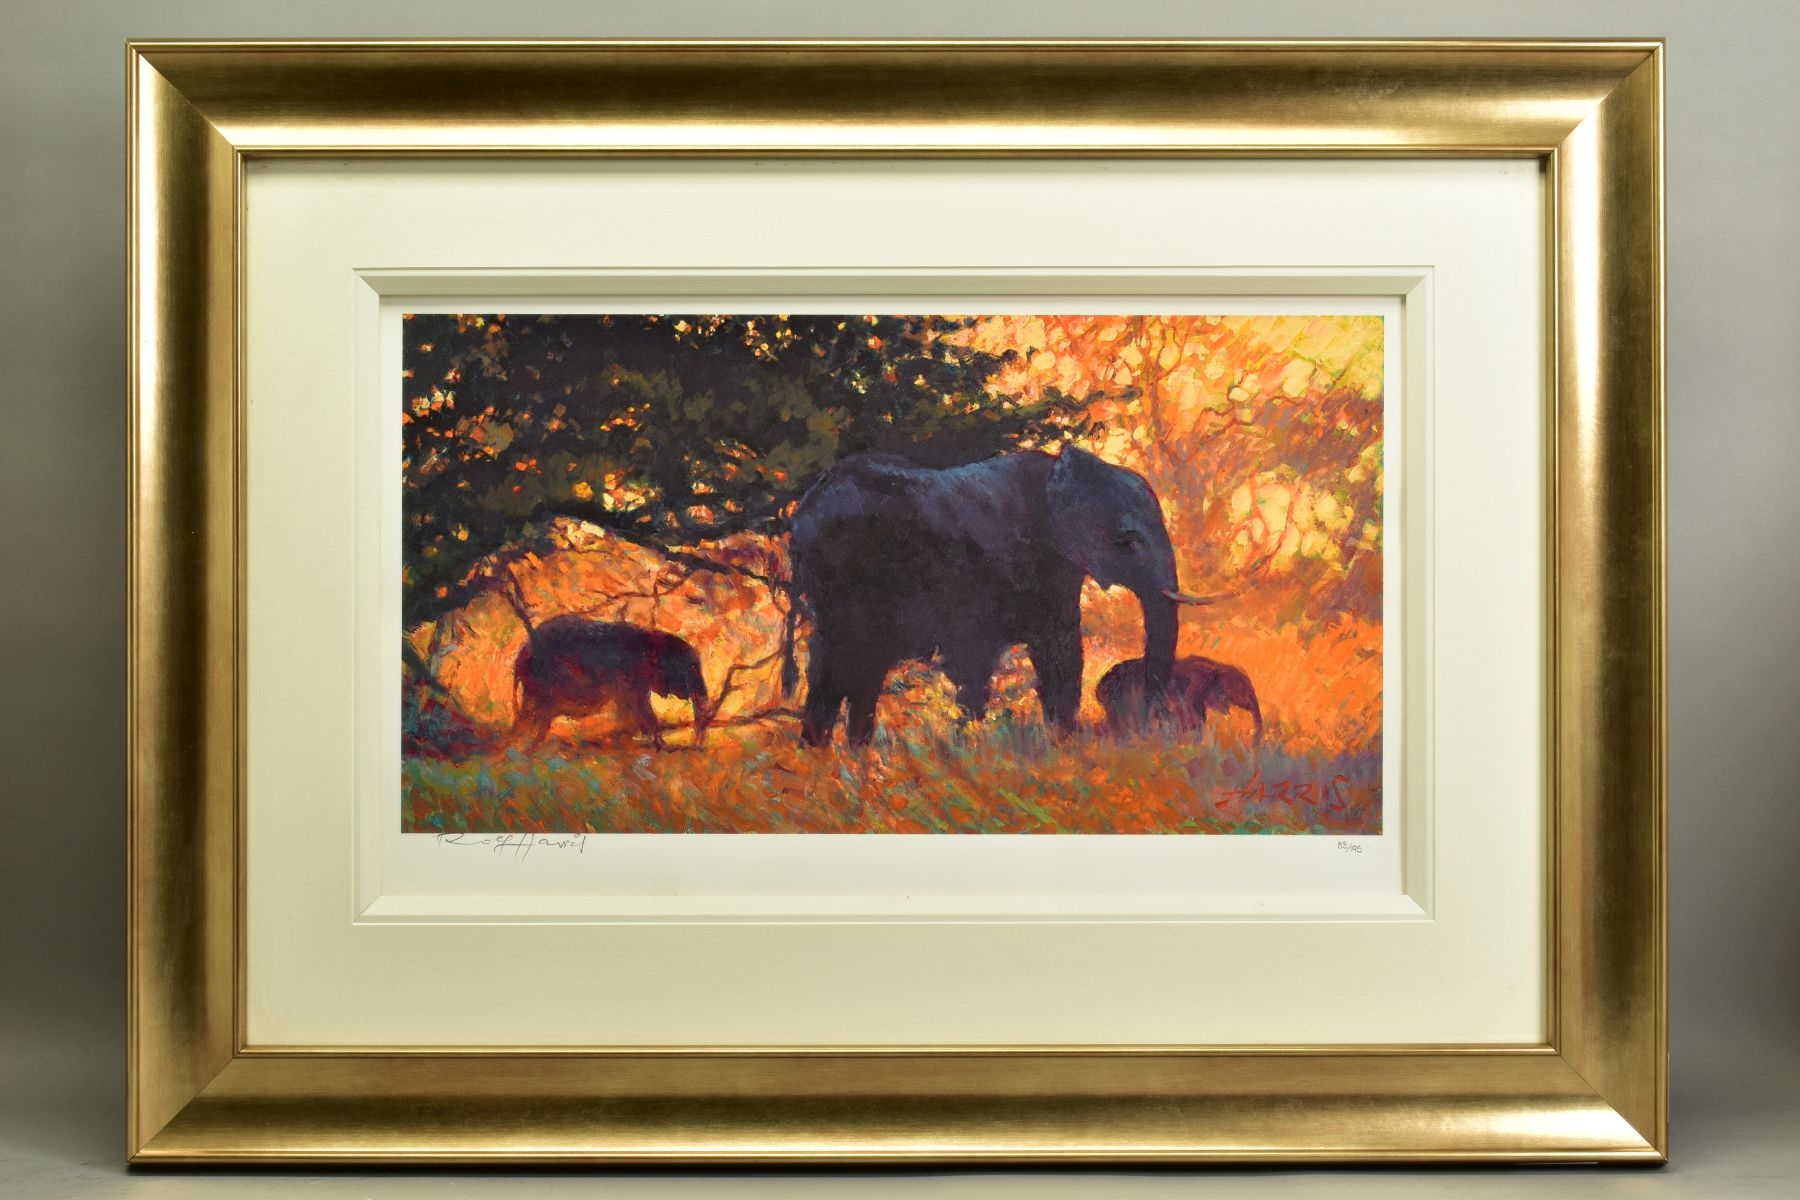 ROLF HARRIS (AUSTRALIAN 1930), 'Backlit Gold', a Limited Edition print of Indian Elephants, 83/